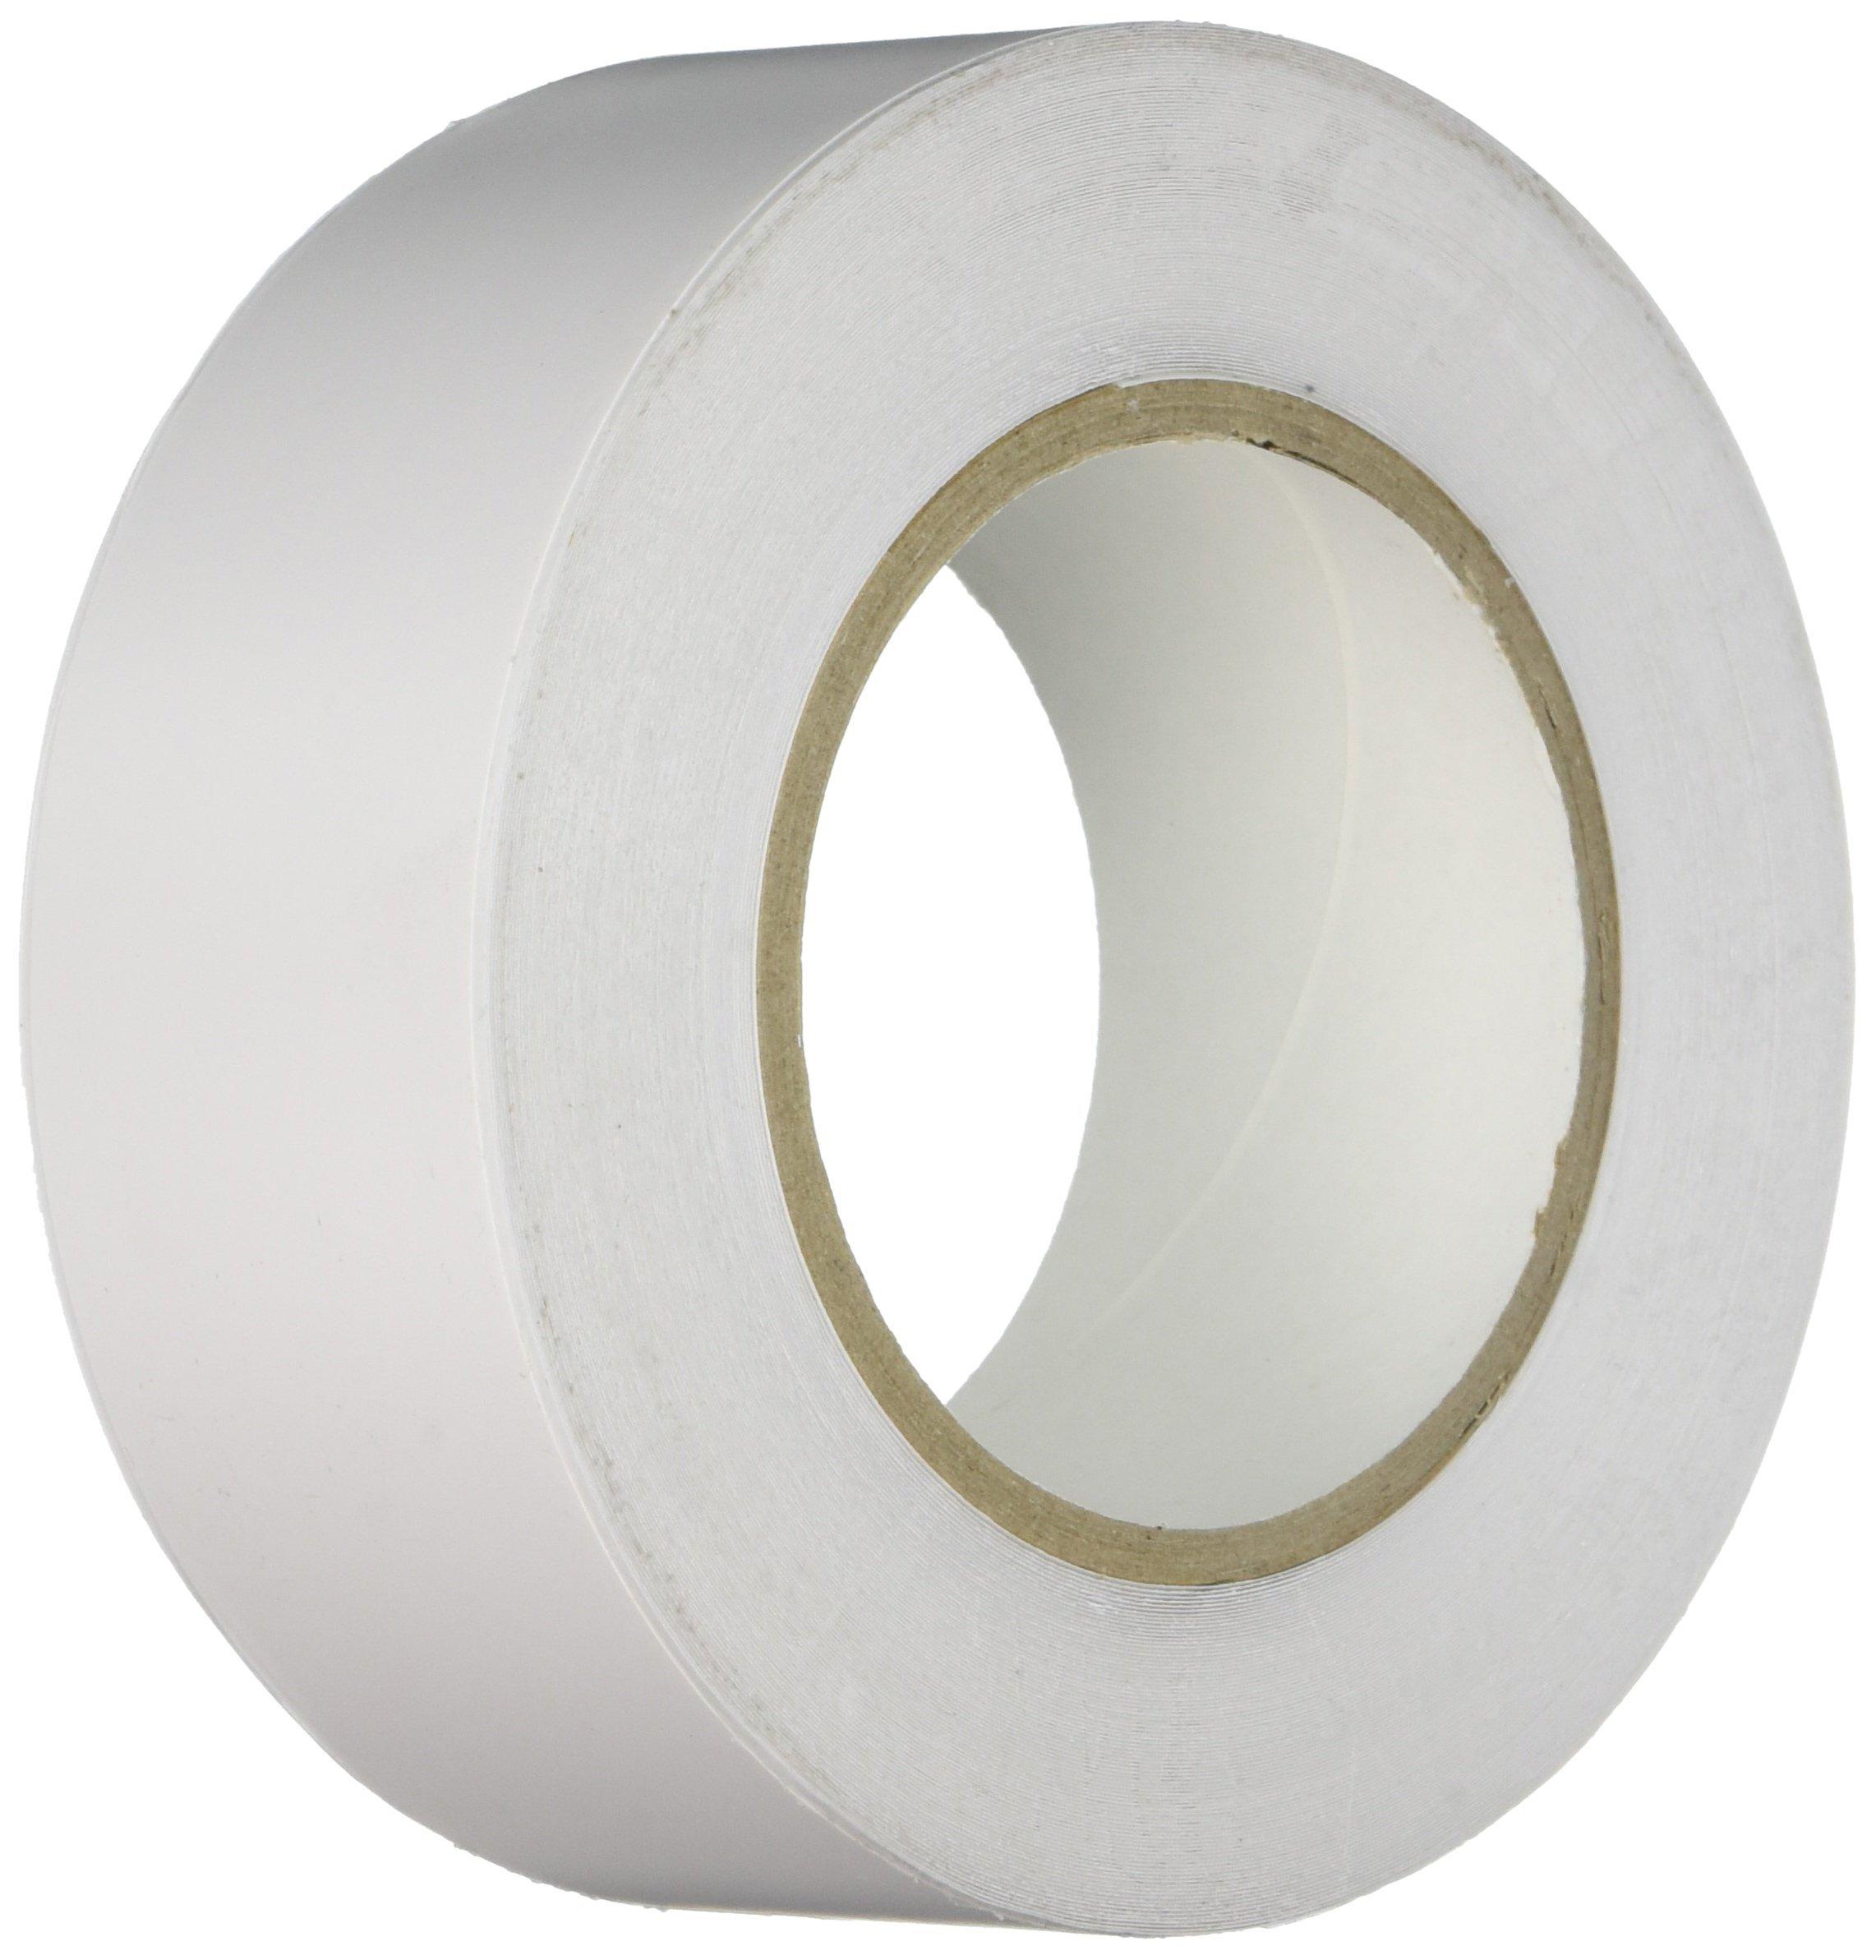 Heskins FLOOR2W White Tapeline Floor Marking Tape, 98' Length, 2'' Width